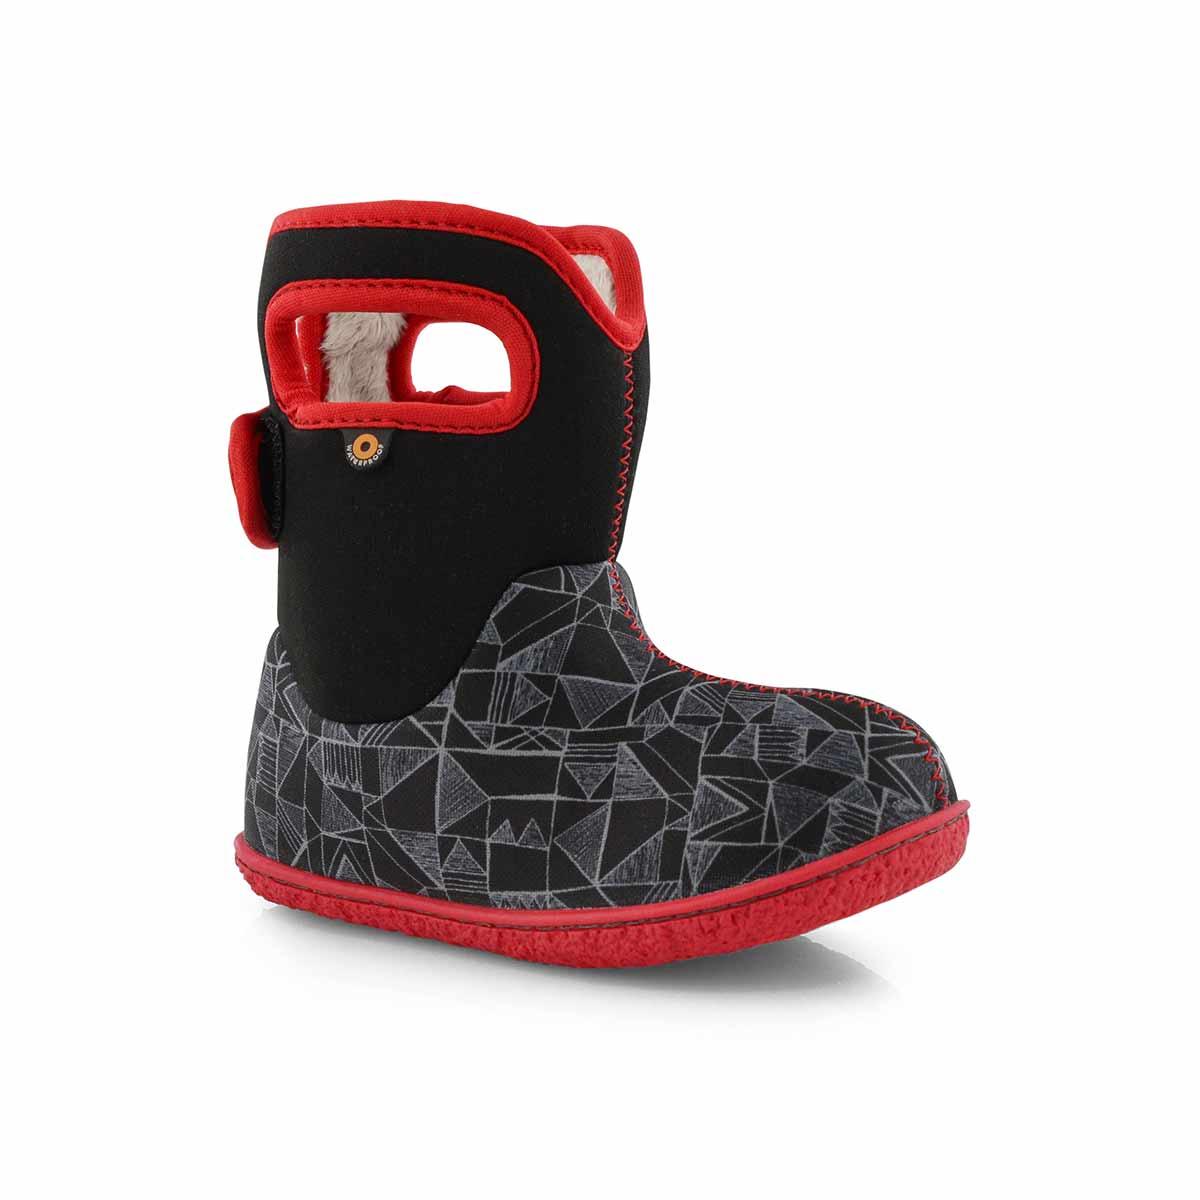 Bogs Outdoor Boots Boys Baby Maze Geo Waterproof Insulated 72464I